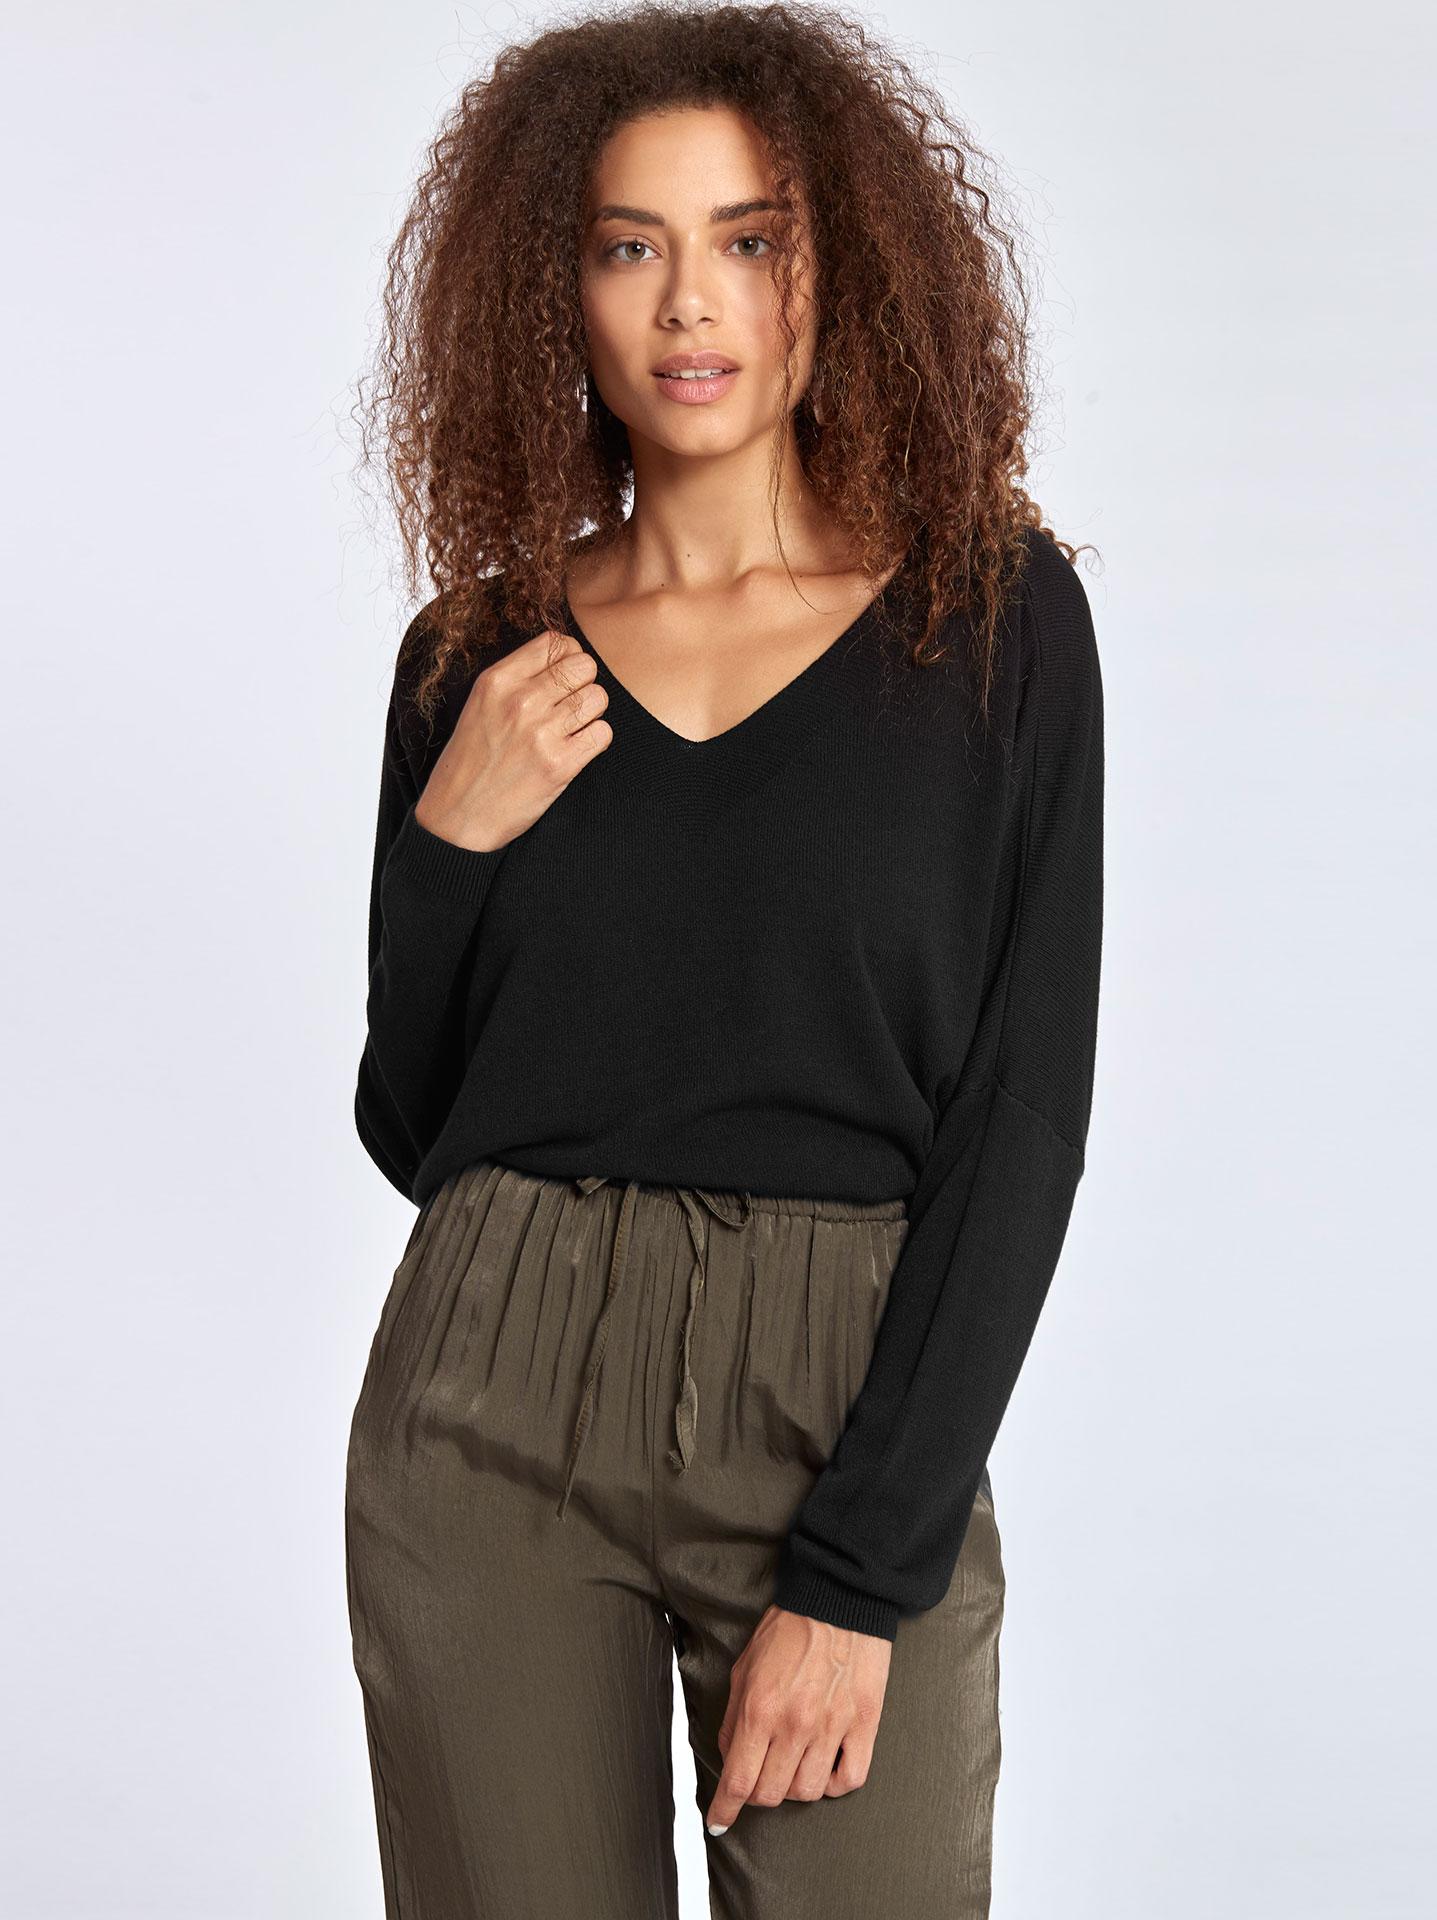 720fe1c2cf50 Μακρυμάνικη μπλούζα με v λαιμόκοψη σε μαυρο